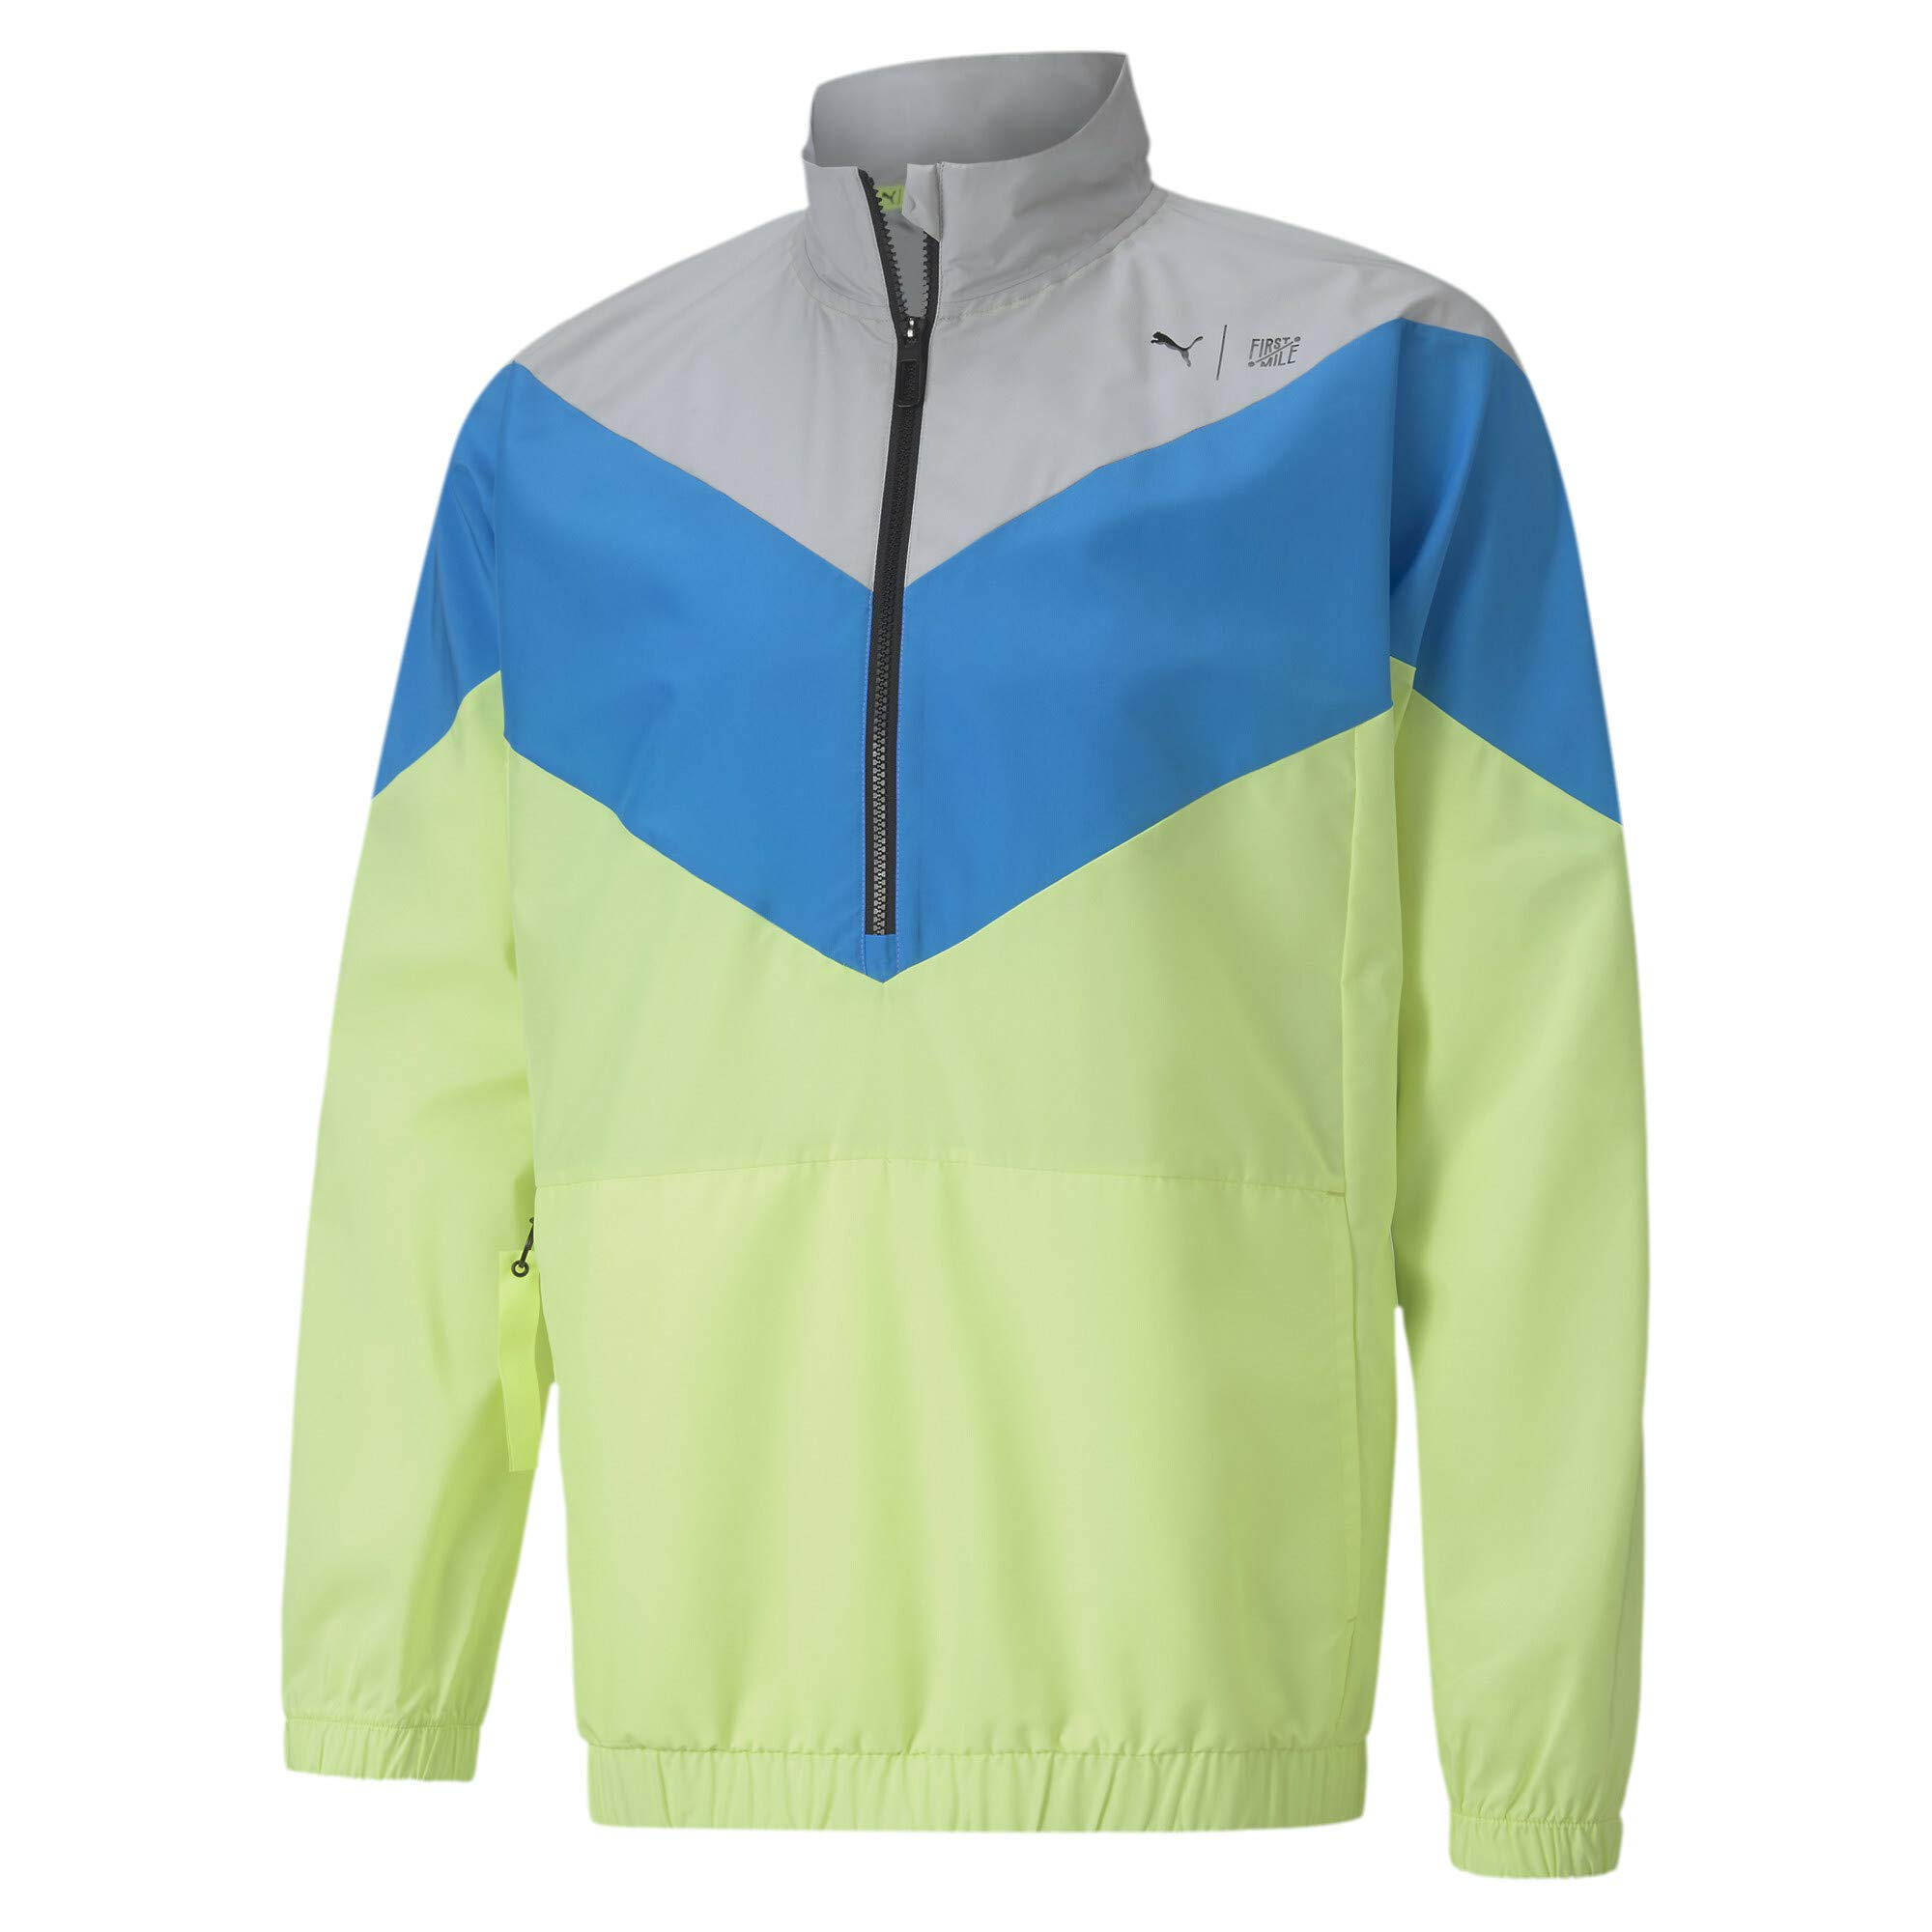 PUMA Herren Train First Mile Xtreme Woven Jacket Trainingsjacke, Gray Violet-NRG